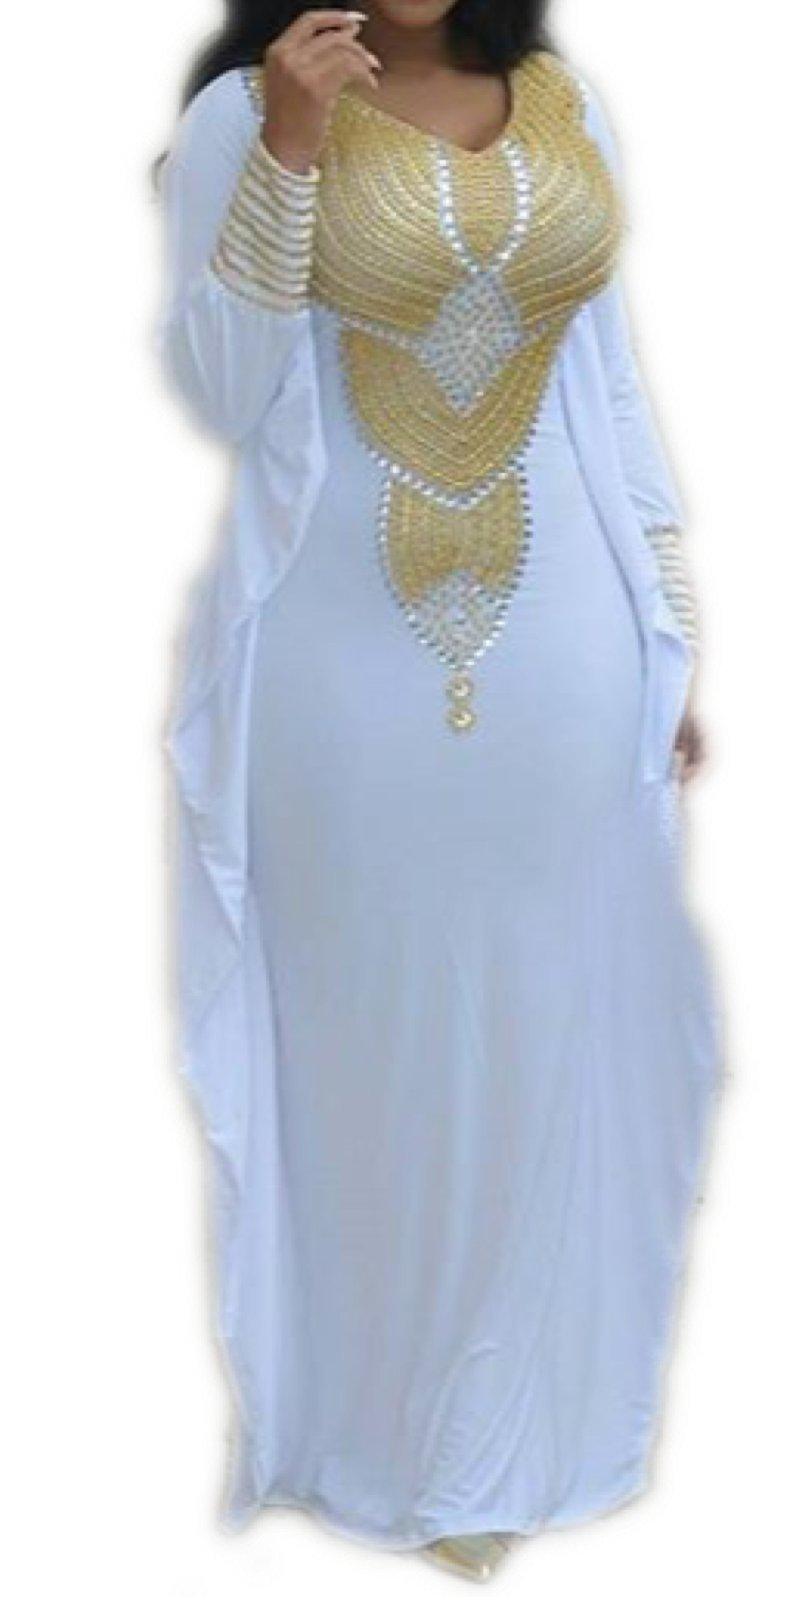 Allena - Fitted Batwing 04 - Handbeaded Kaftan, Dress, Abaya (XX-Large, White)